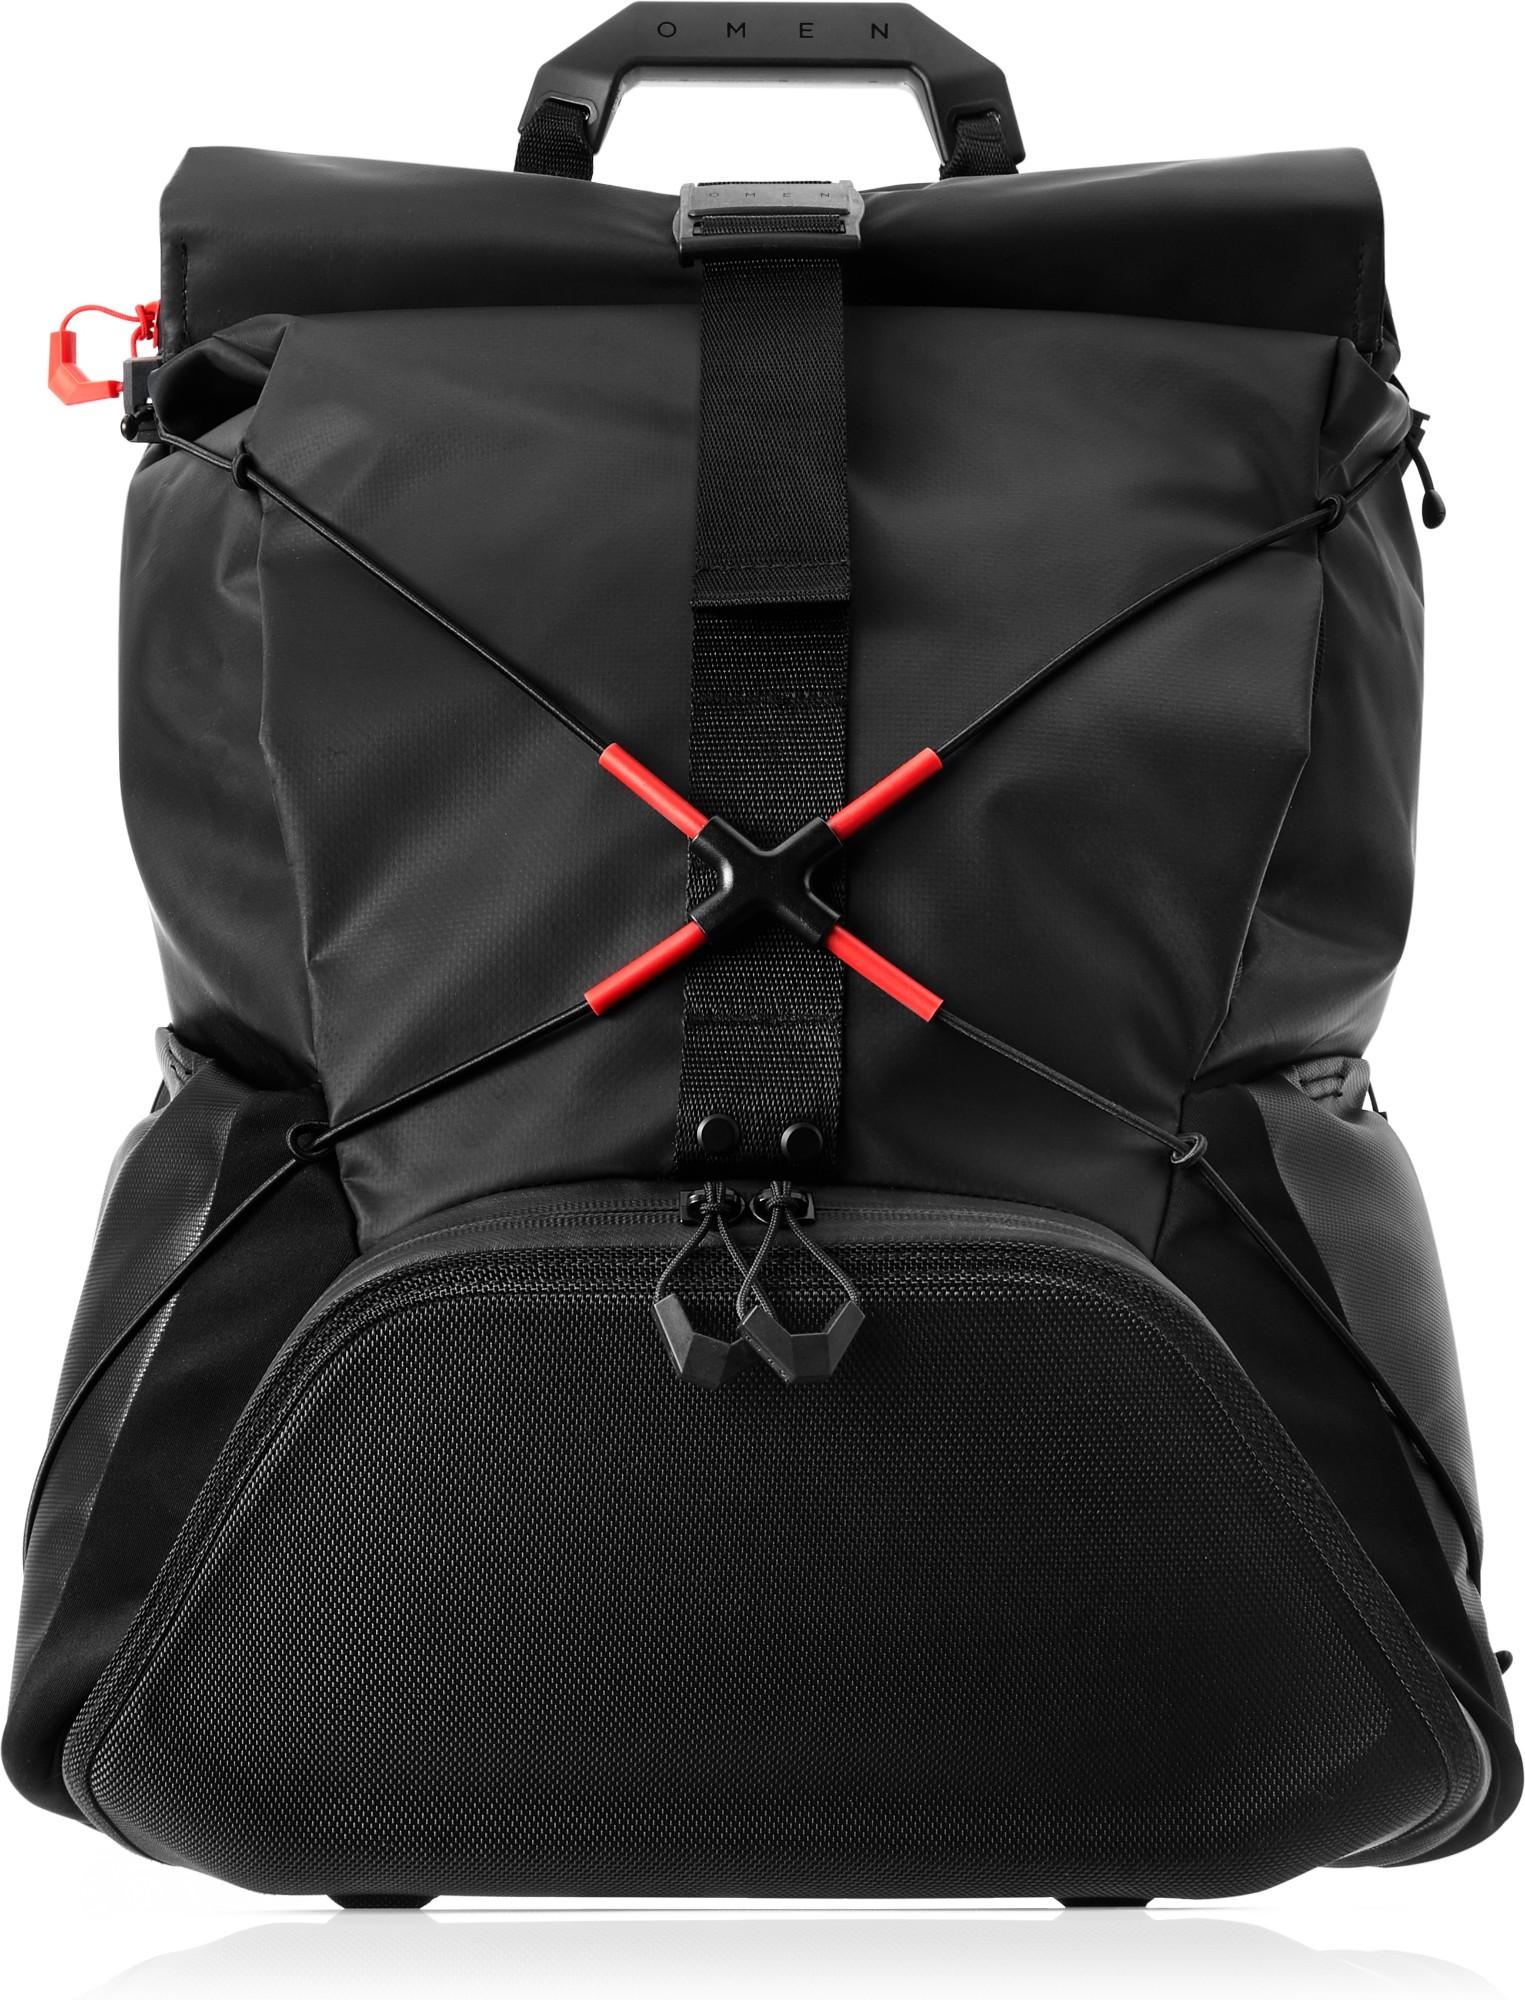 HP OMEN X by Transceptor Backpack notebook case 43.2 cm (17